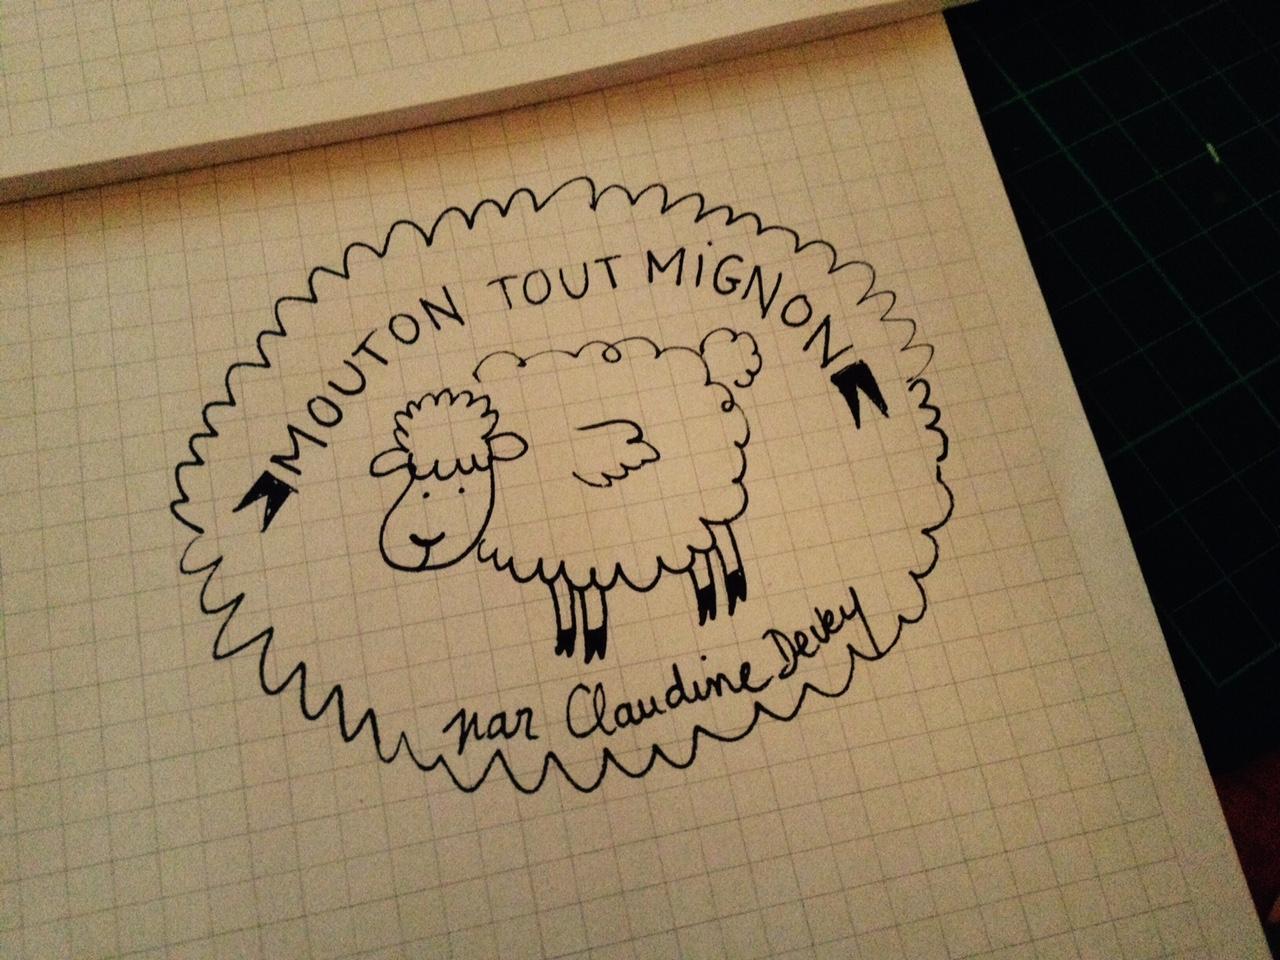 Mouton Claudine